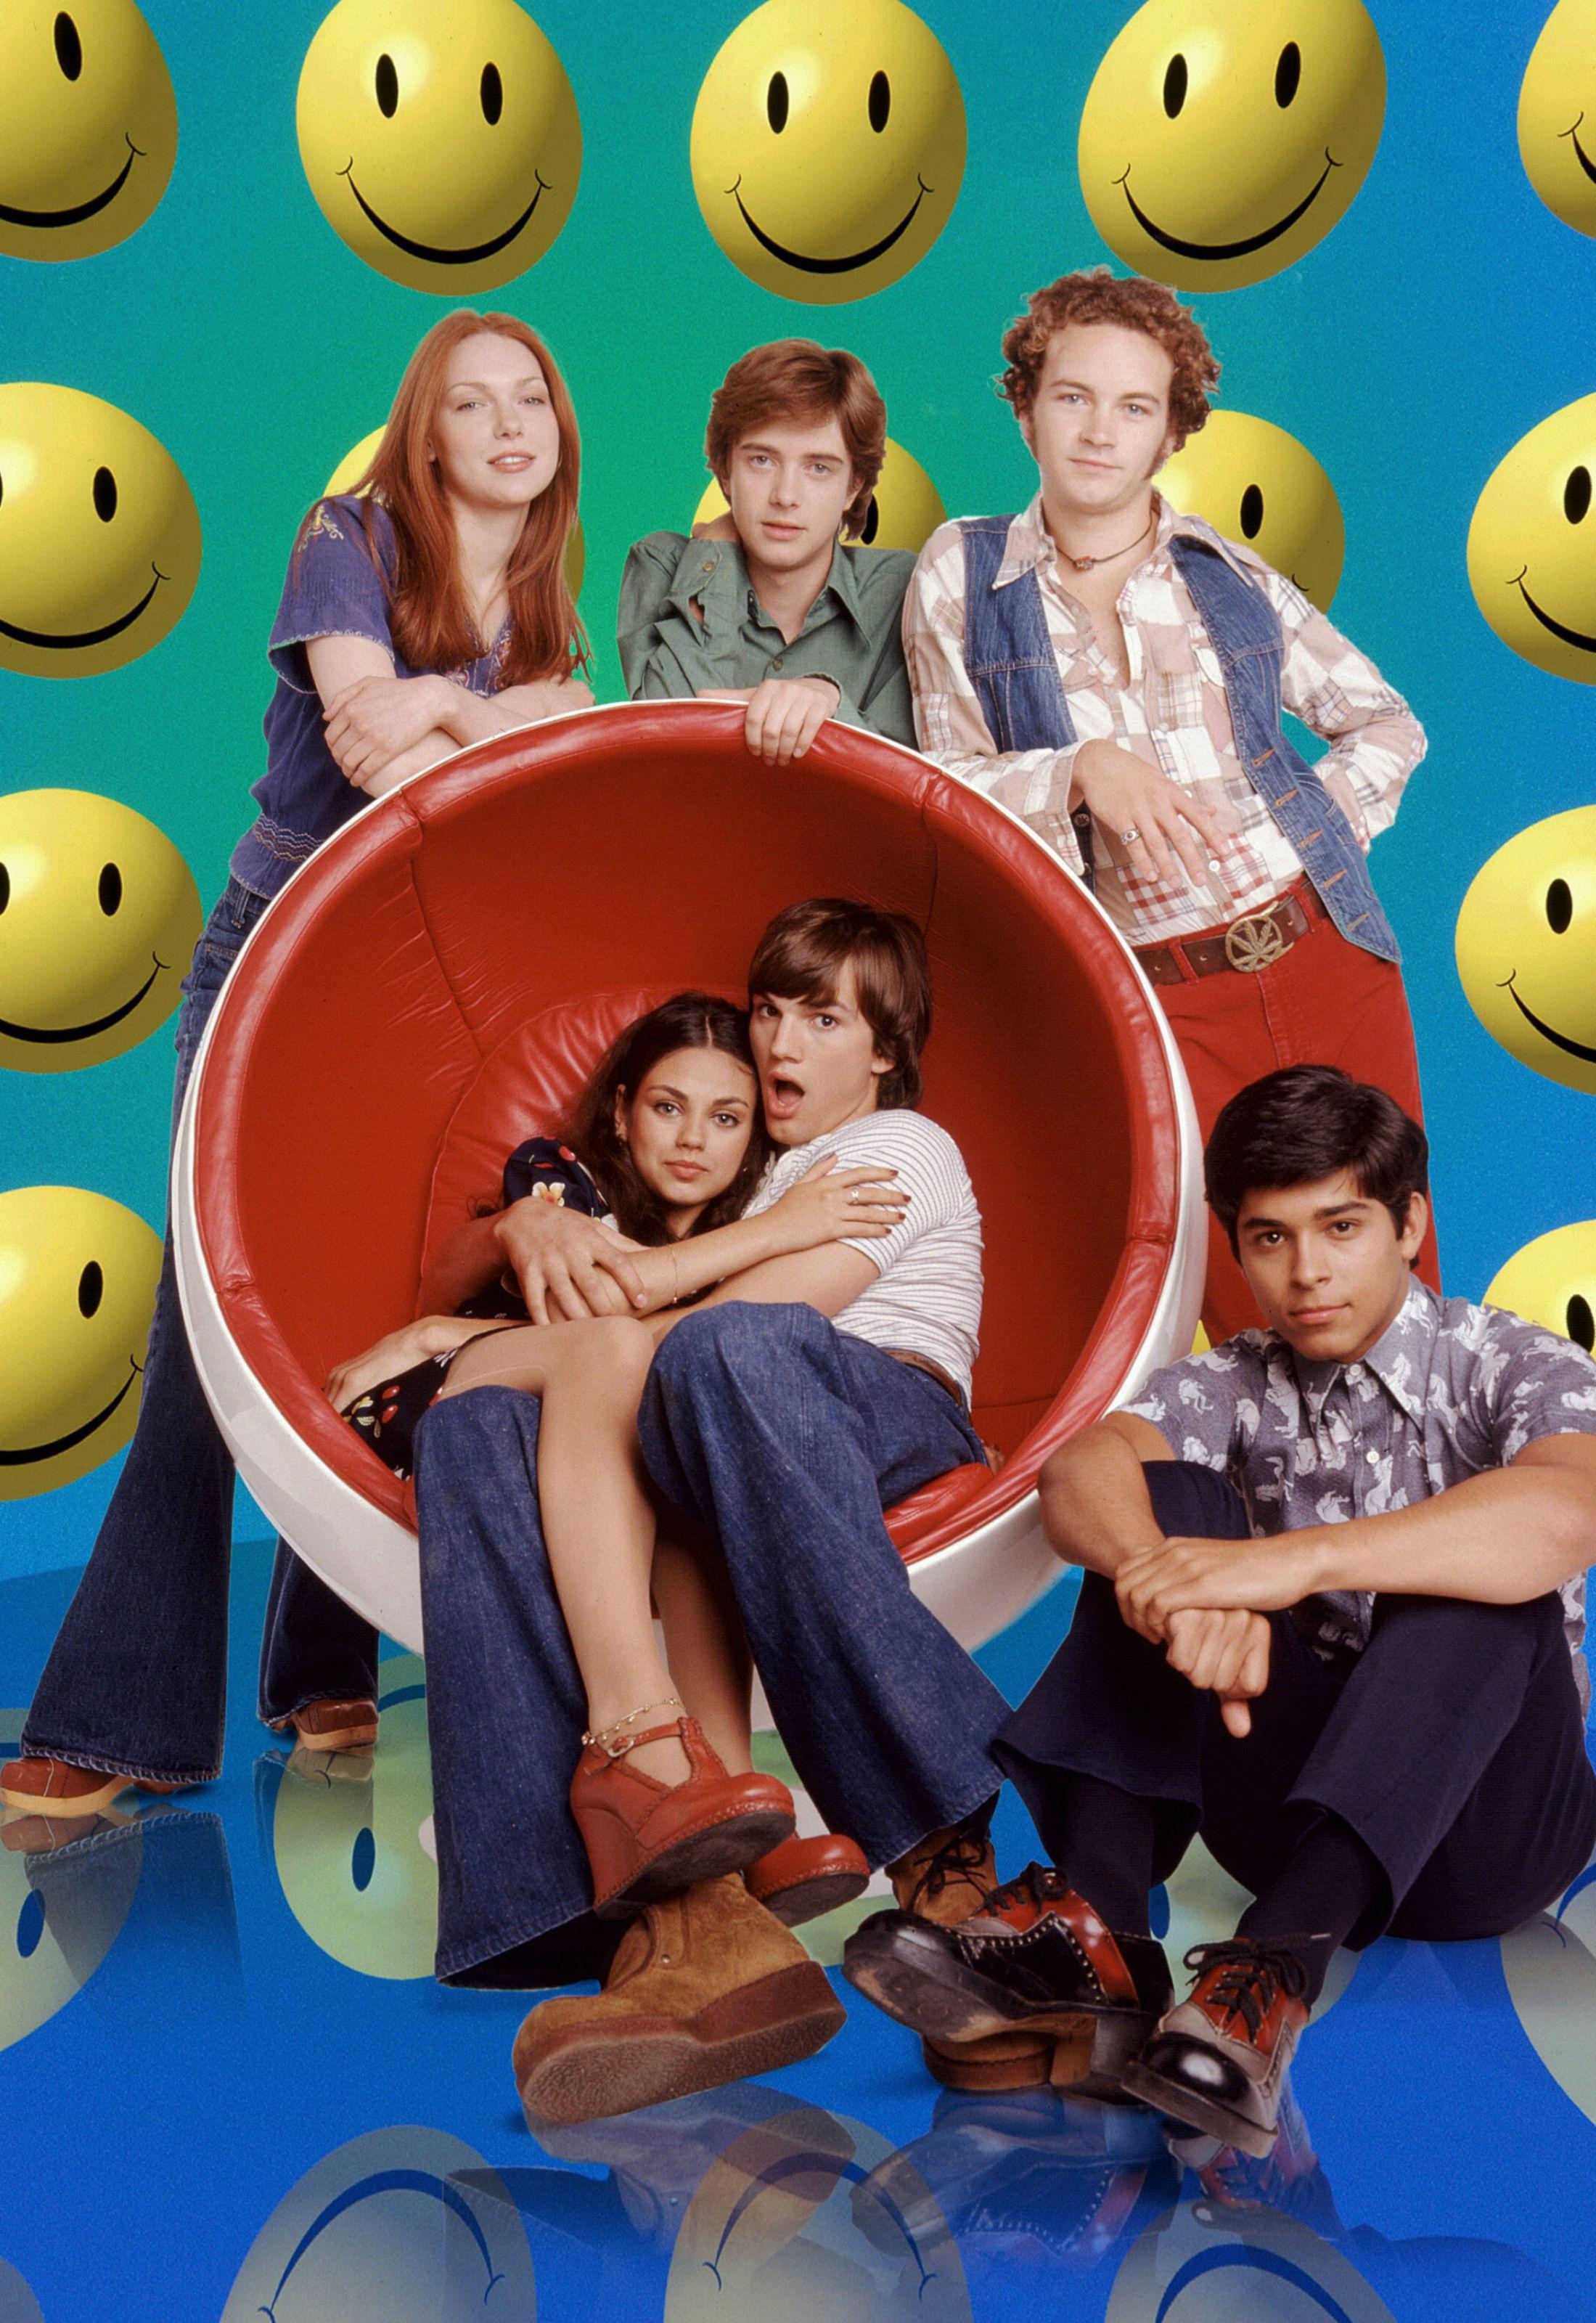 MTVs Siesta Key show returning for third season - News